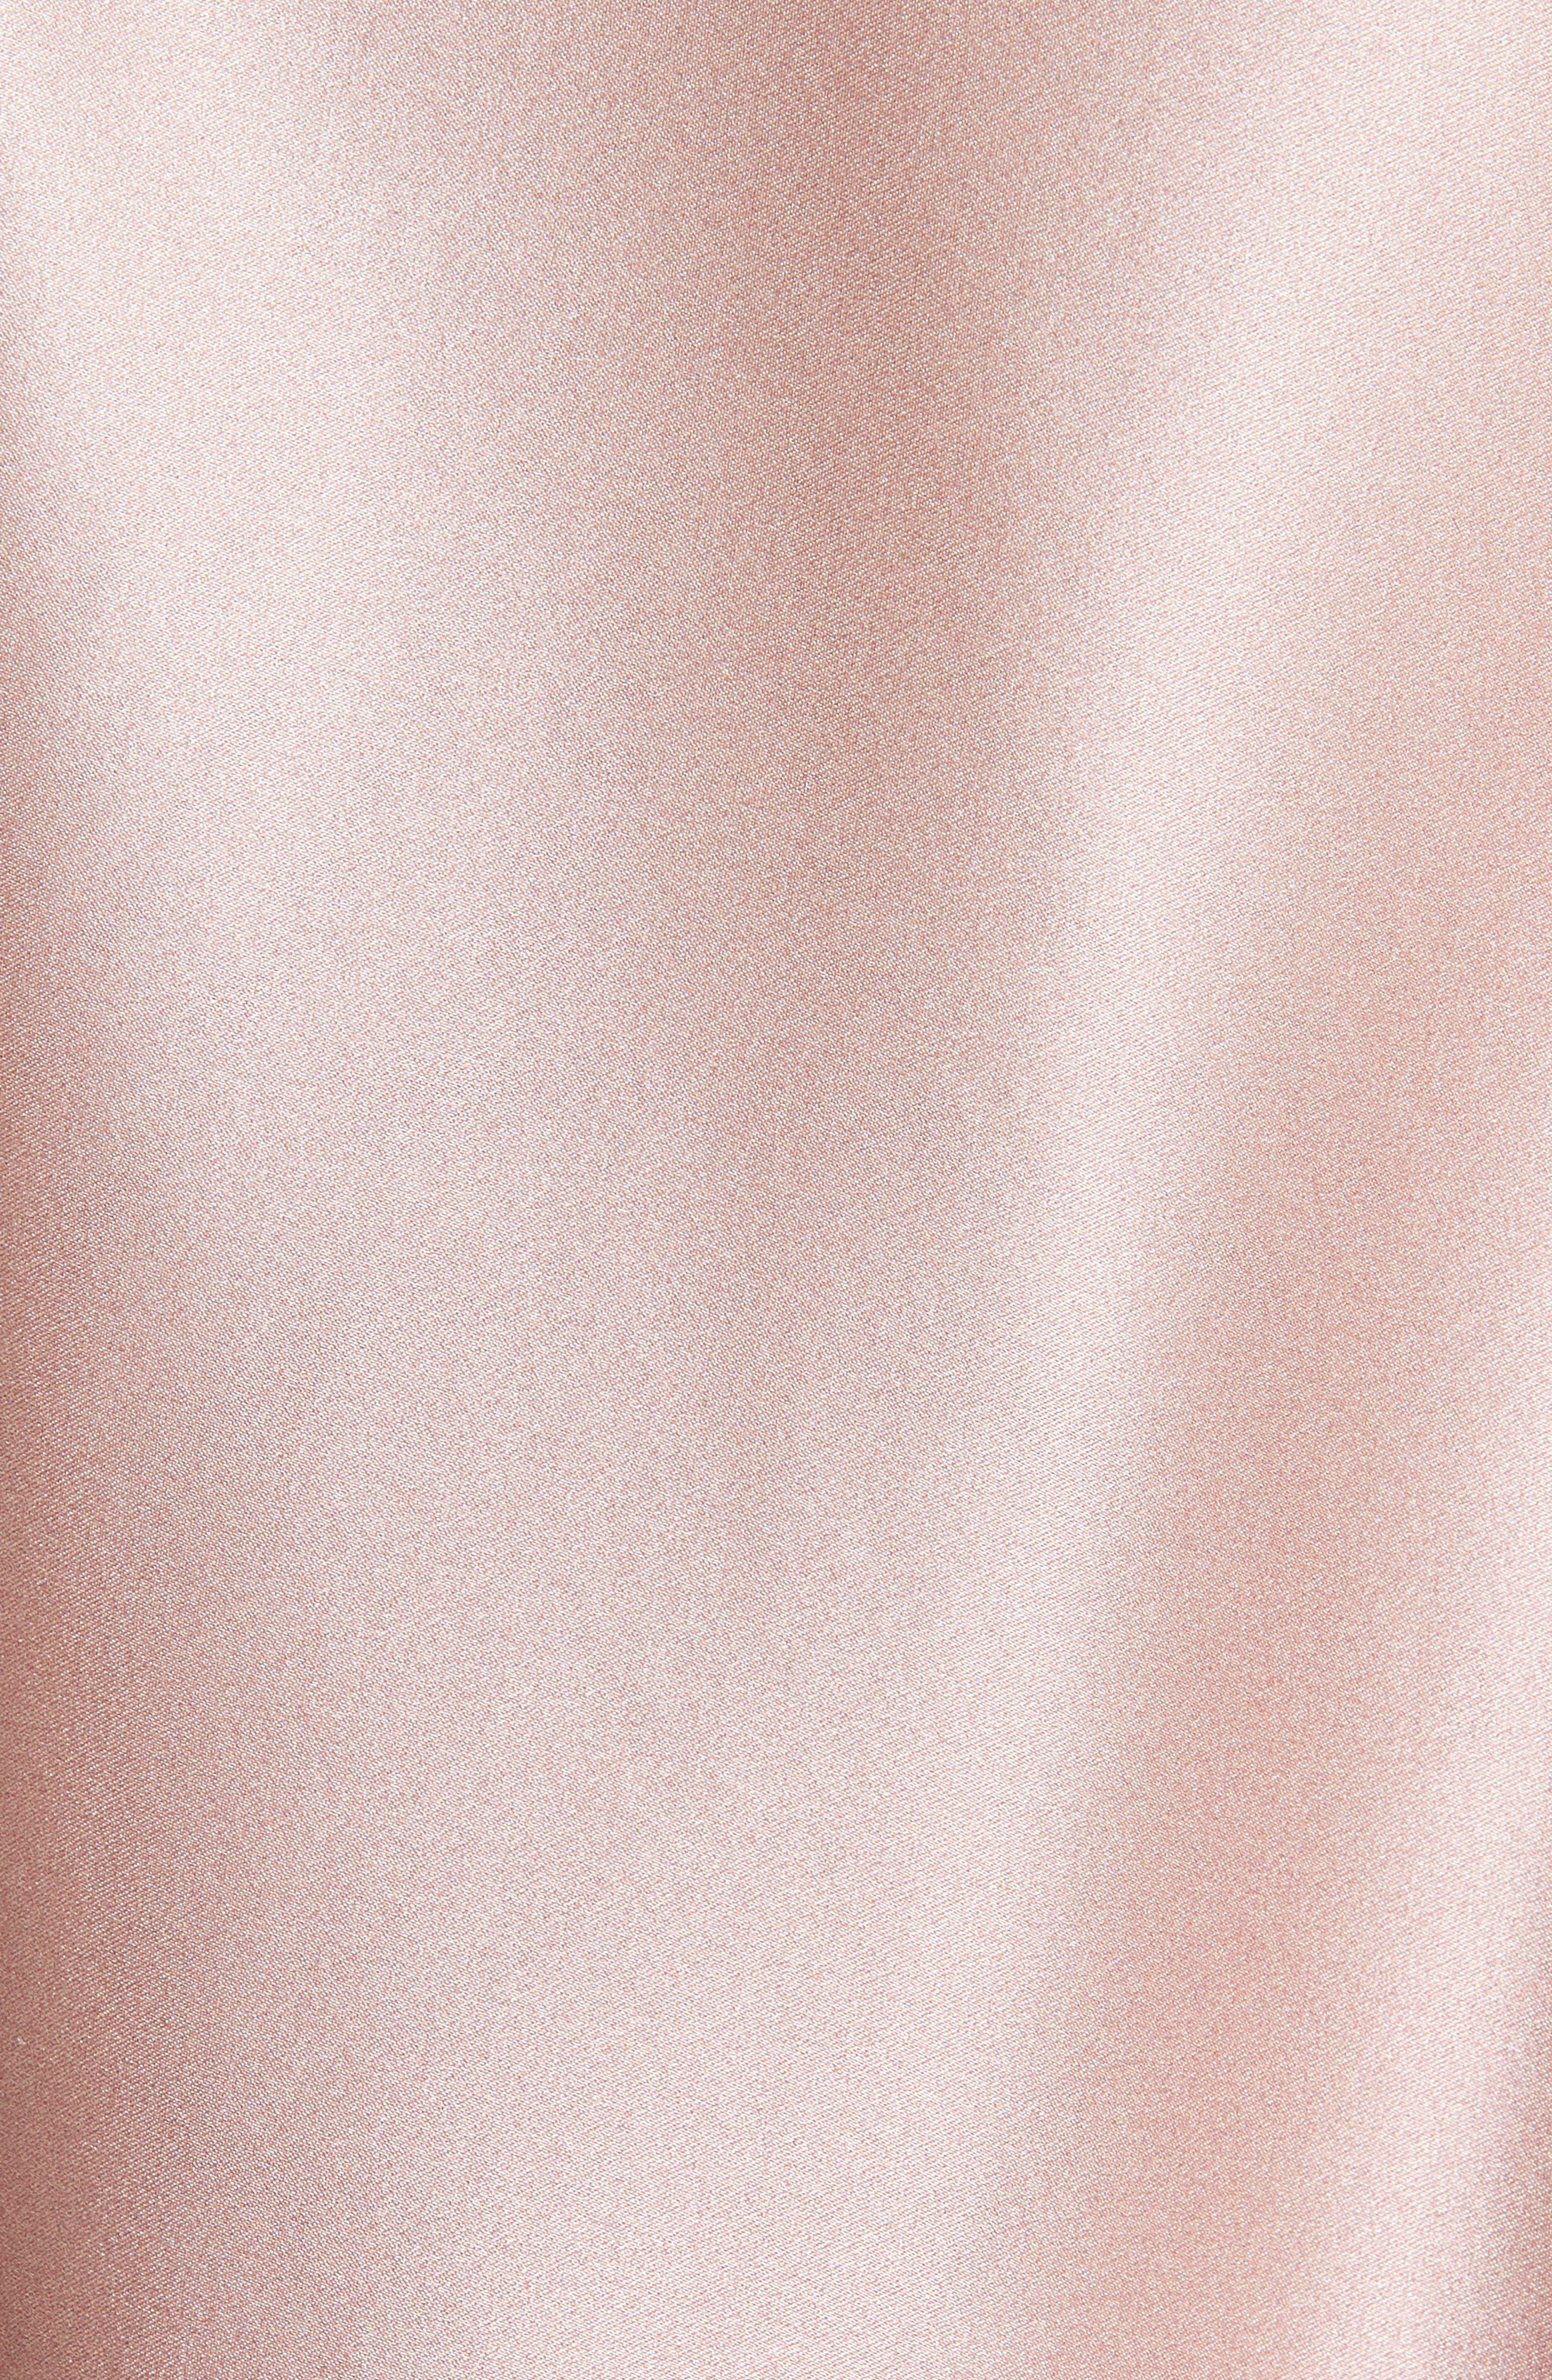 GREY Jason Wu Ombré Silk Shirt,                             Alternate thumbnail 5, color,                             DESERT ROSE